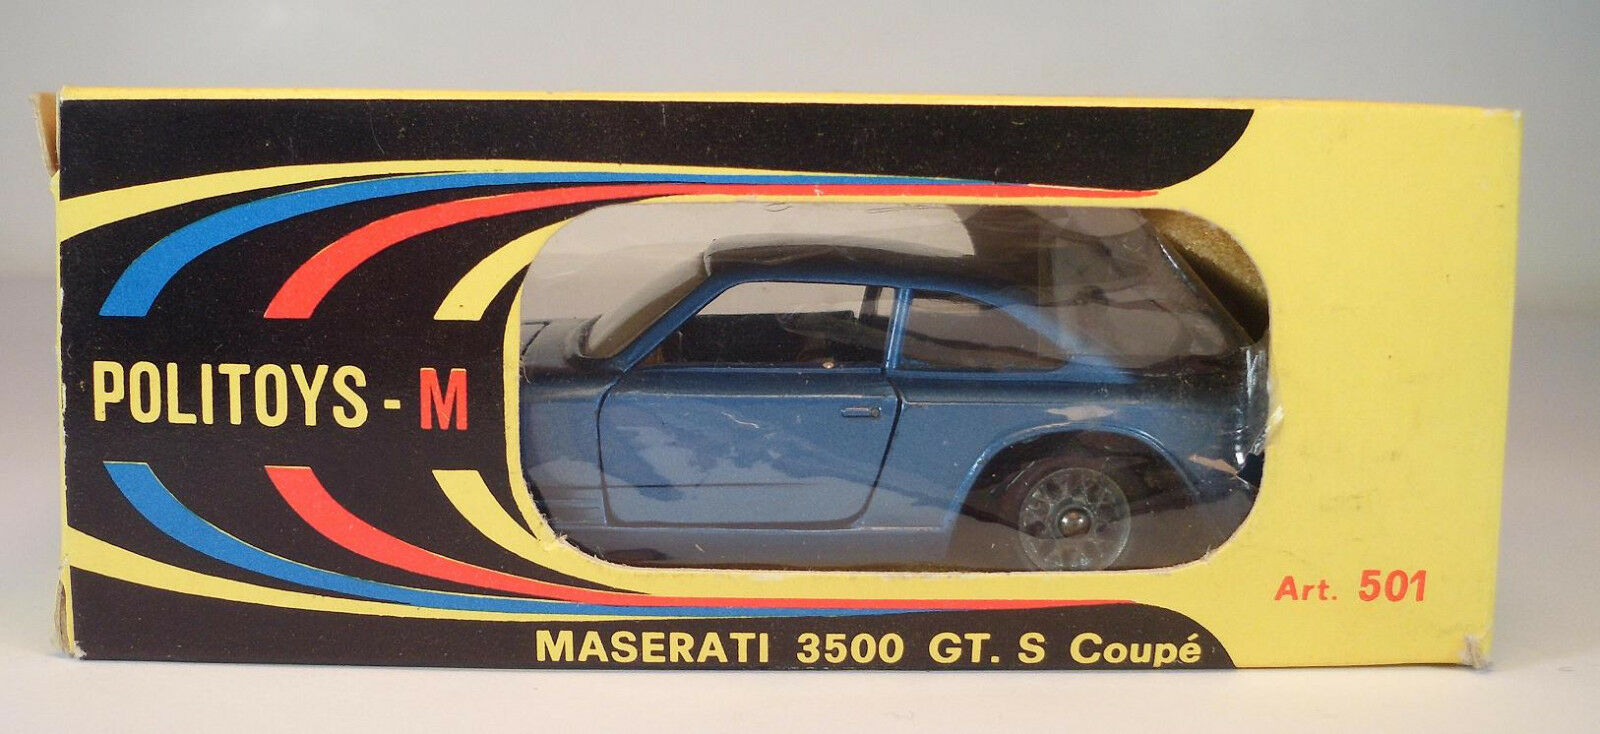 Politoys 1 43 no 501 Maserati 3500  GT bleu METALLIC Sedan 332 800 OVP  052  jusqu'à 70% de réduction